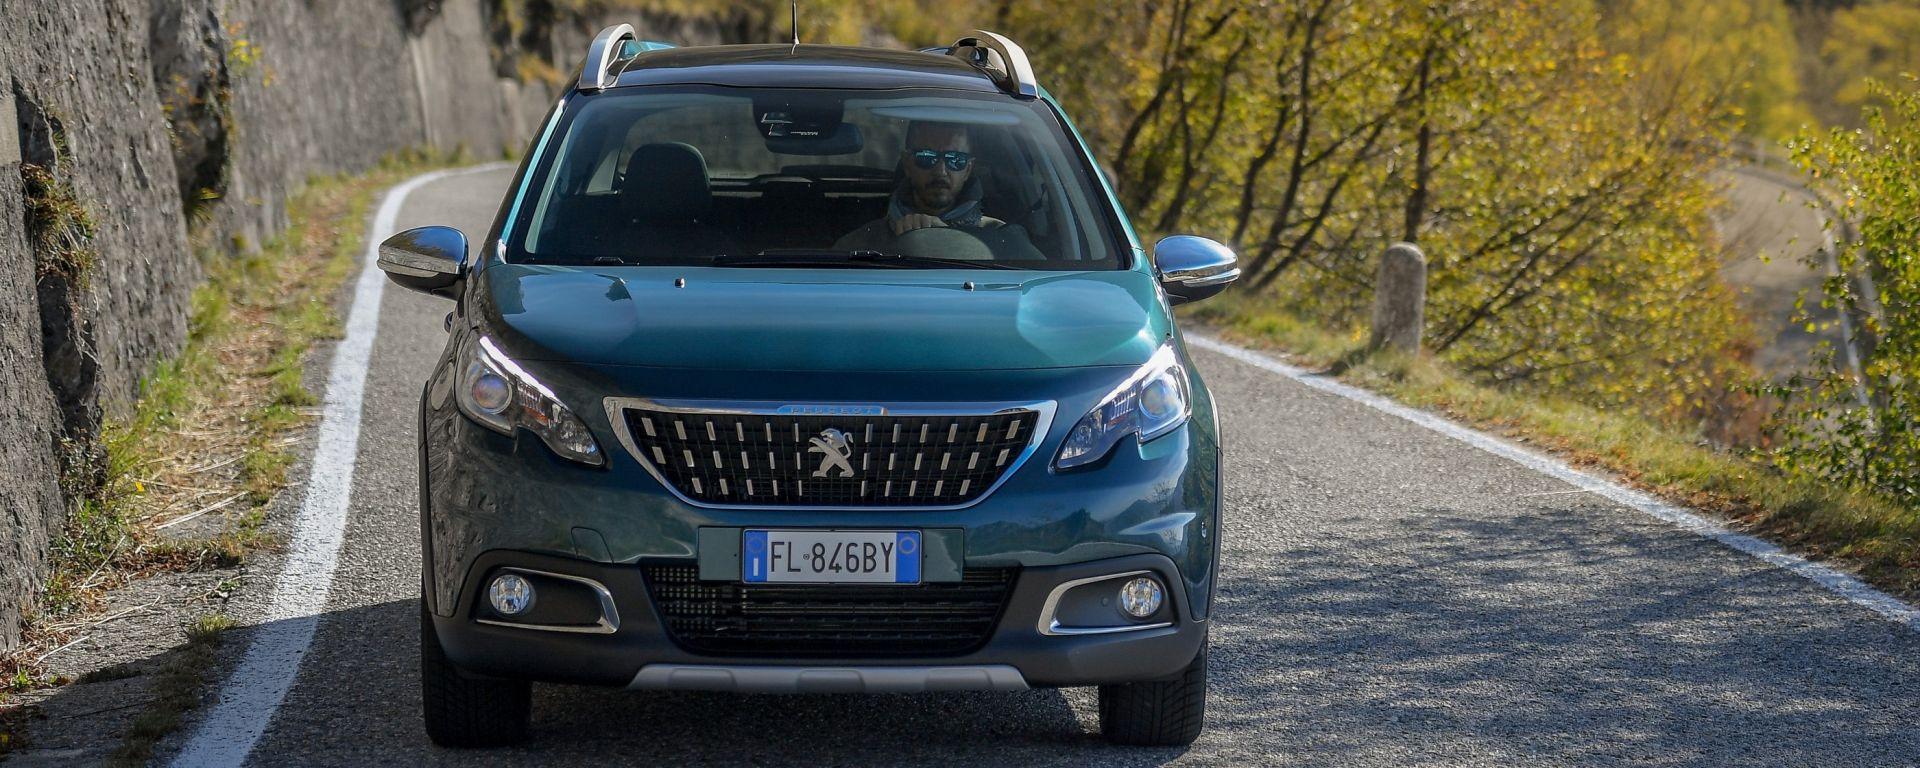 Peugeot 2008: torna la Serie Speciale Crossway